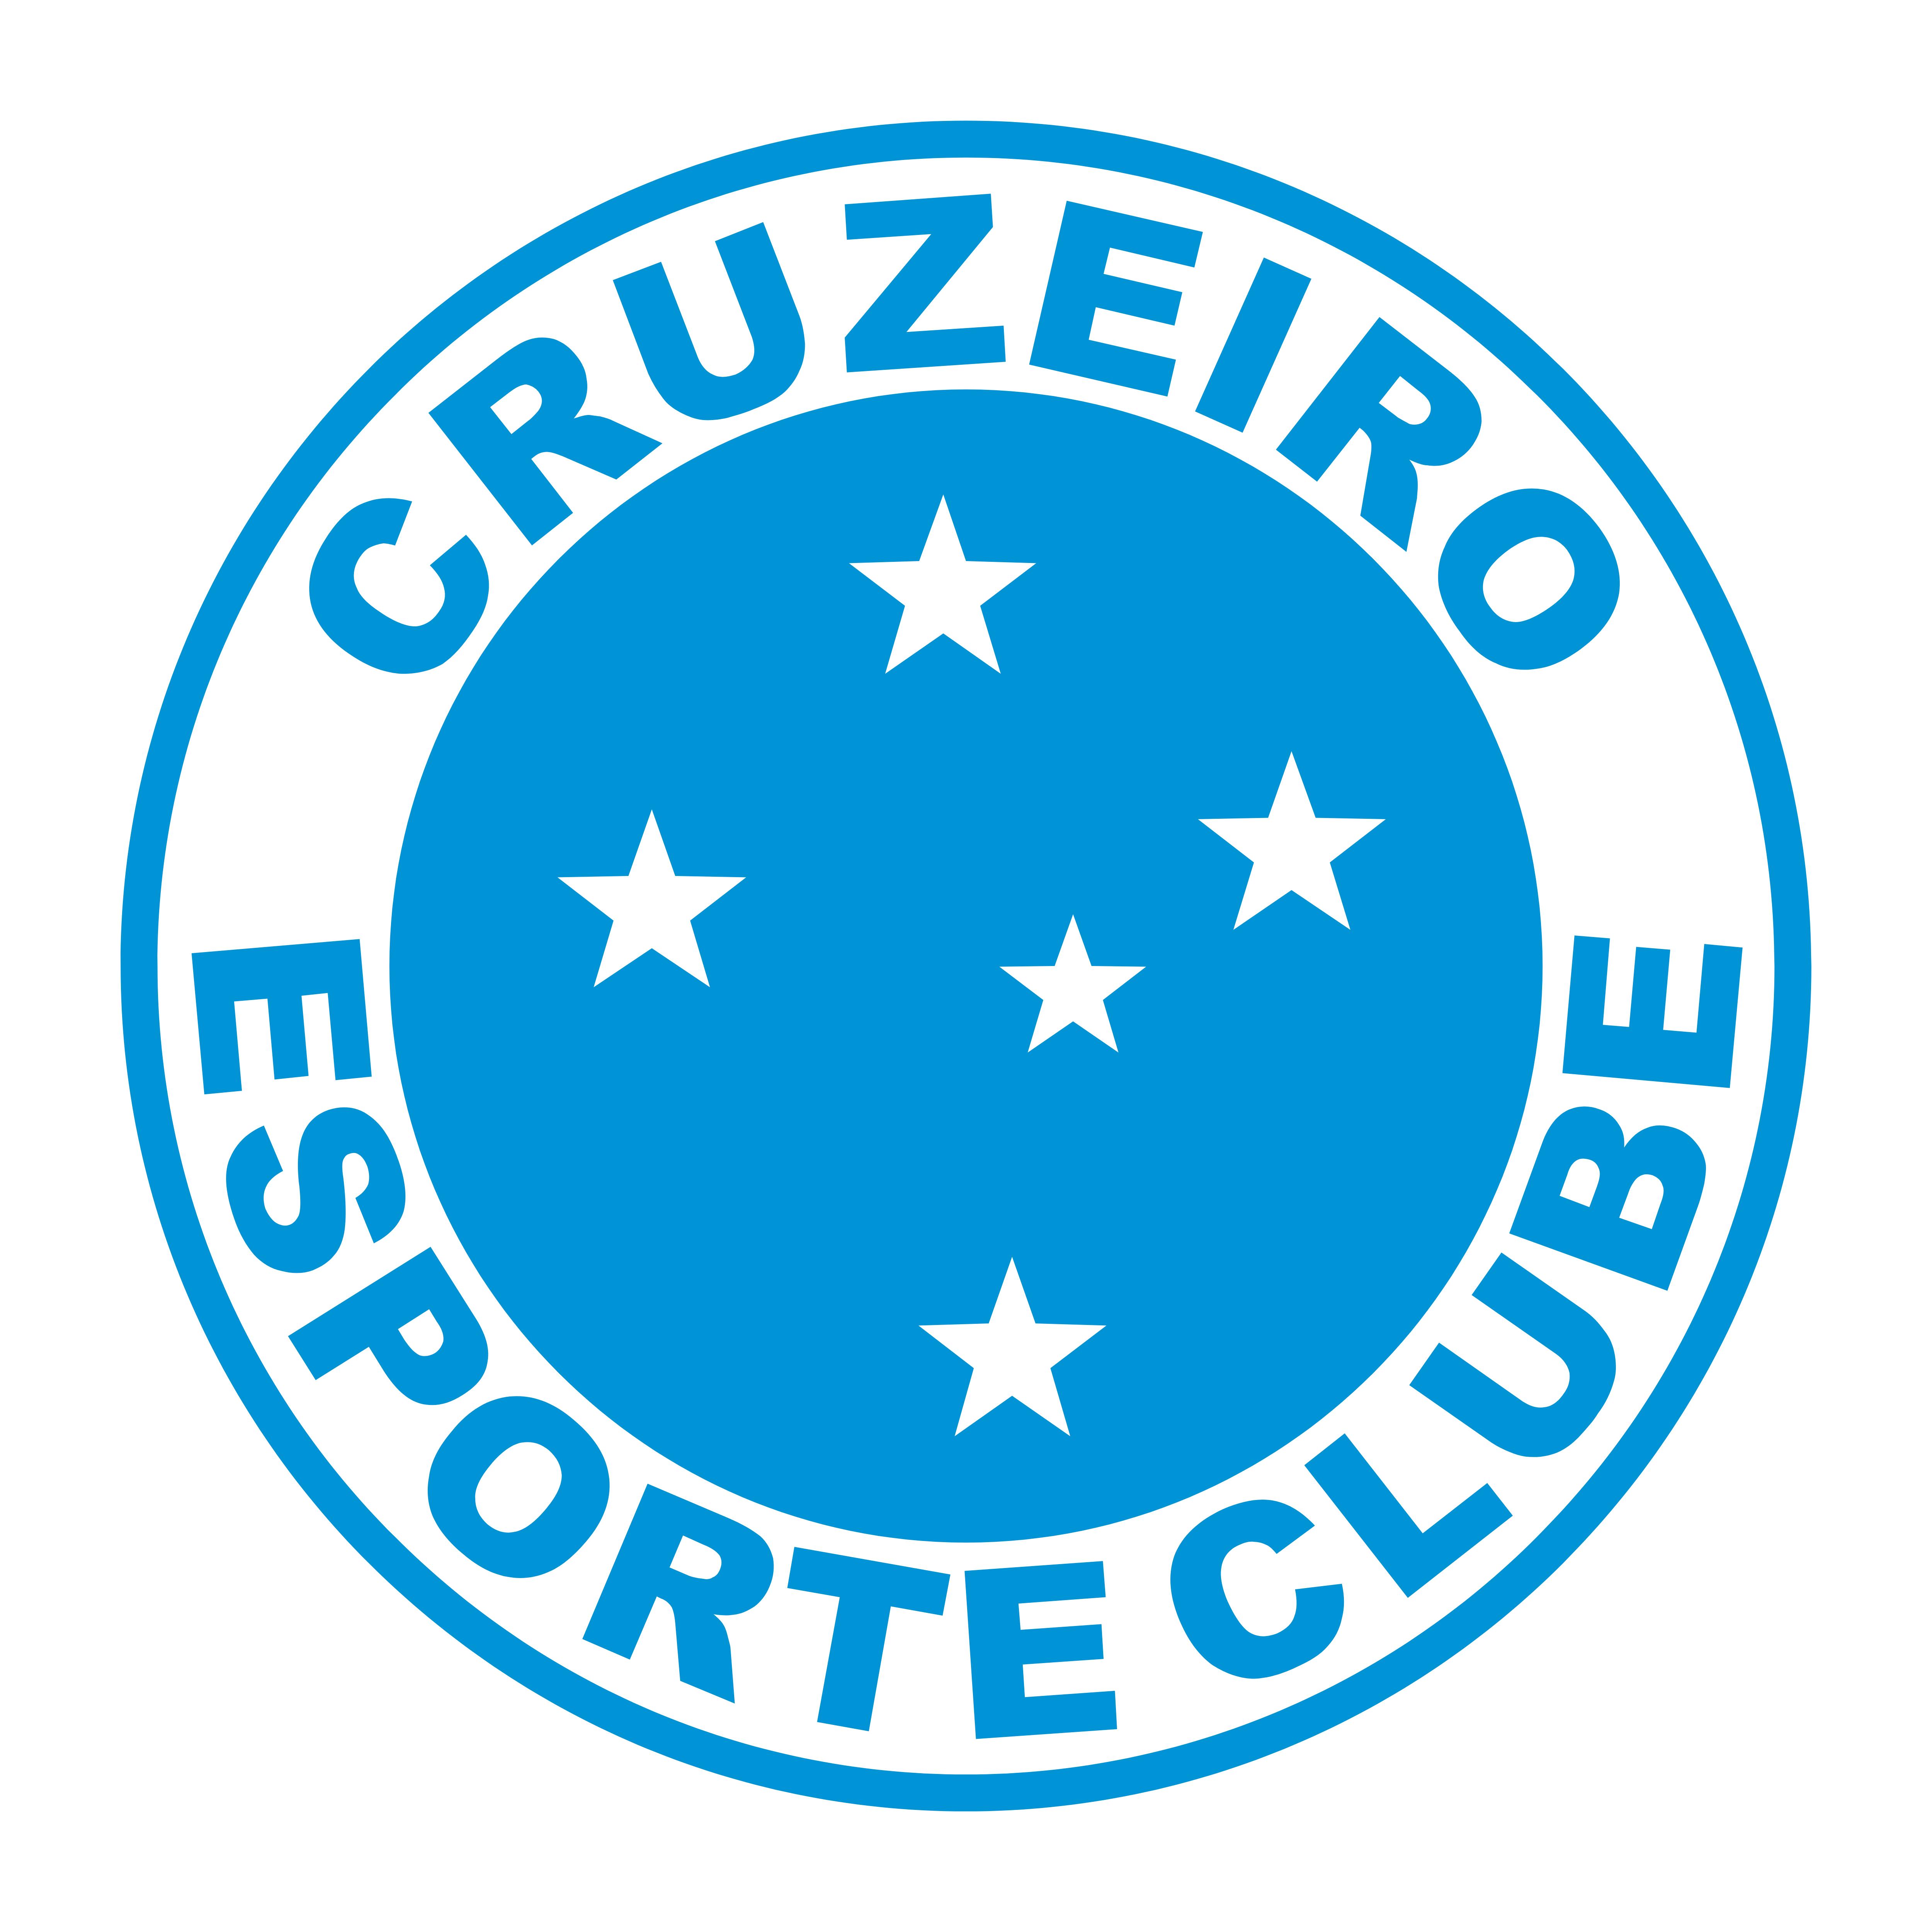 Cruzeiro.